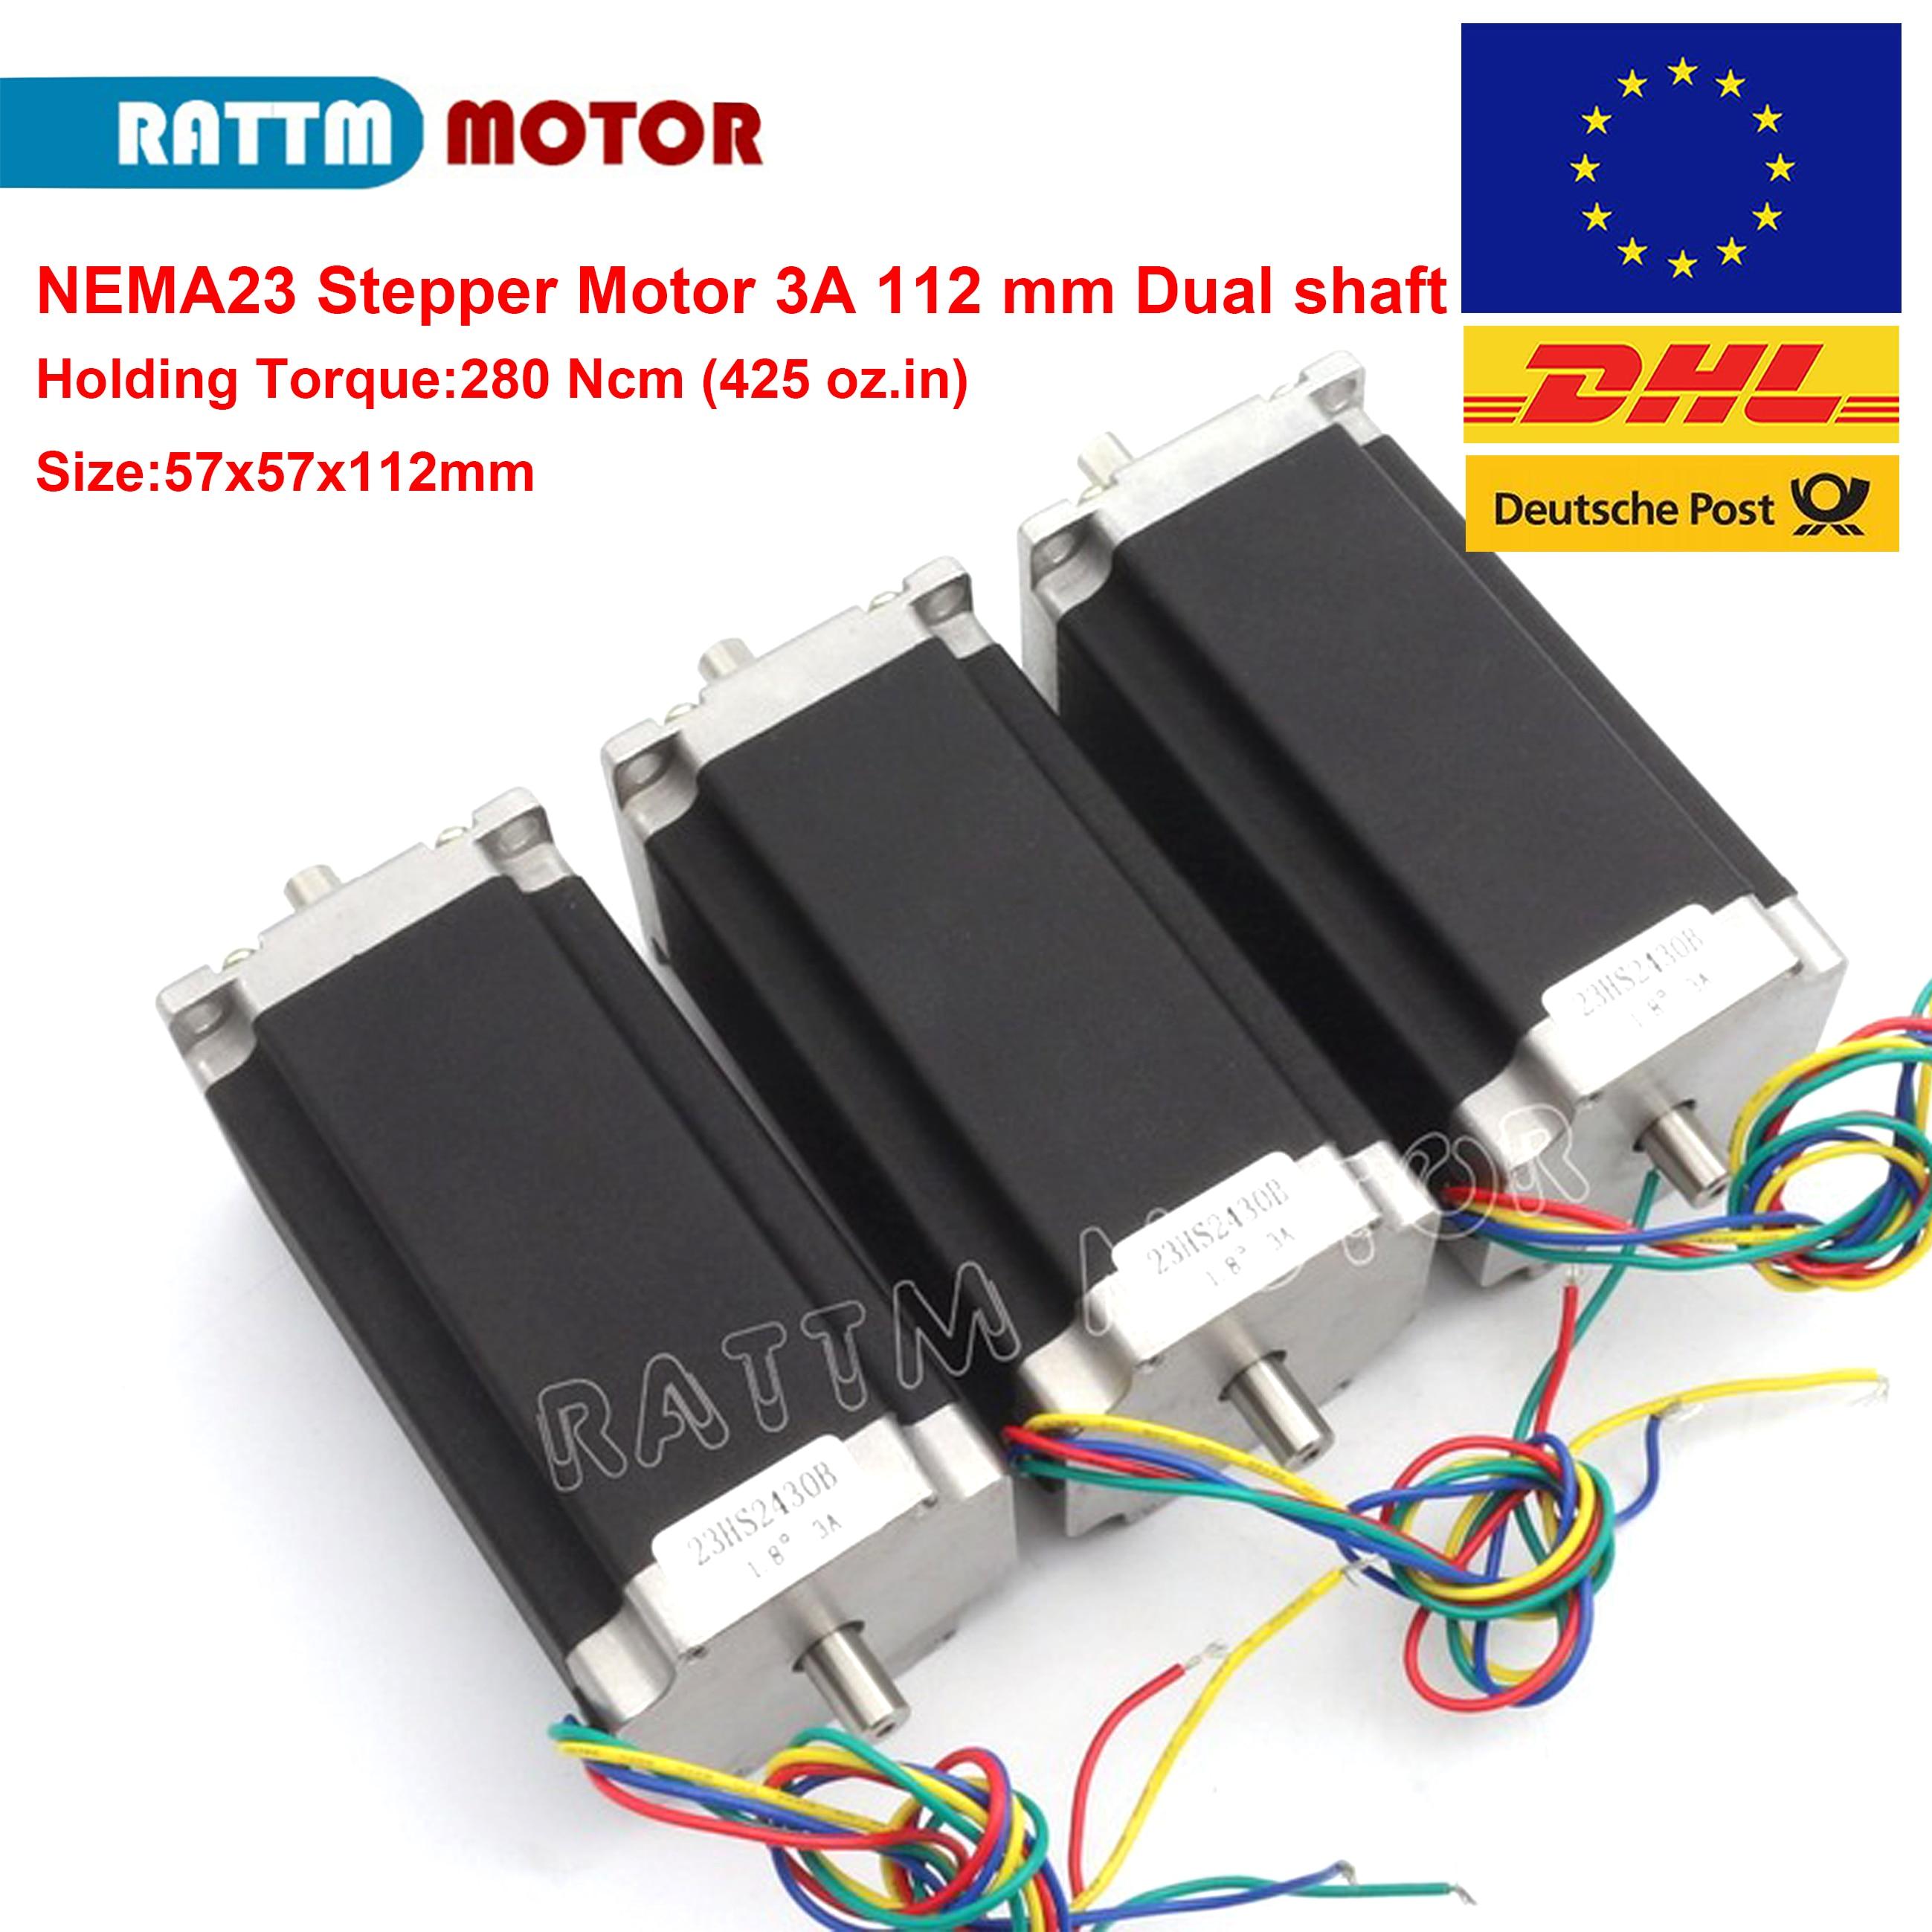 3pcs Nema 23 stepper motor Dual shaft 57x112mm 2.8N.cm 425 Oz-in 4 wires 3A for 3D printer parts CNC engraving machine 23HS2430B